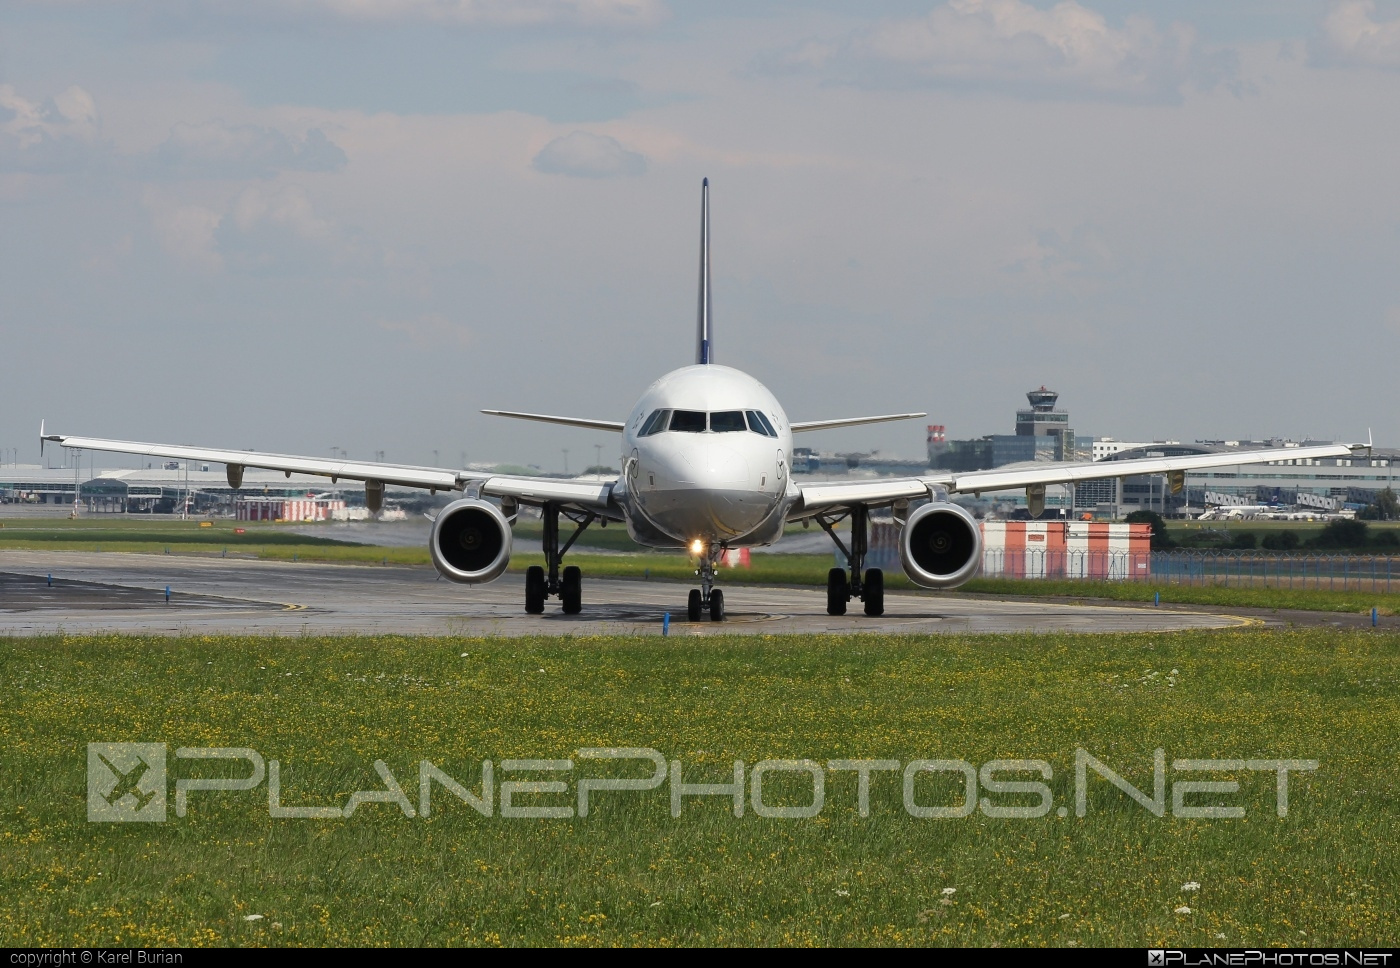 Airbus A321-231 - D-AIDG operated by Lufthansa #a320family #a321 #airbus #airbus321 #lufthansa